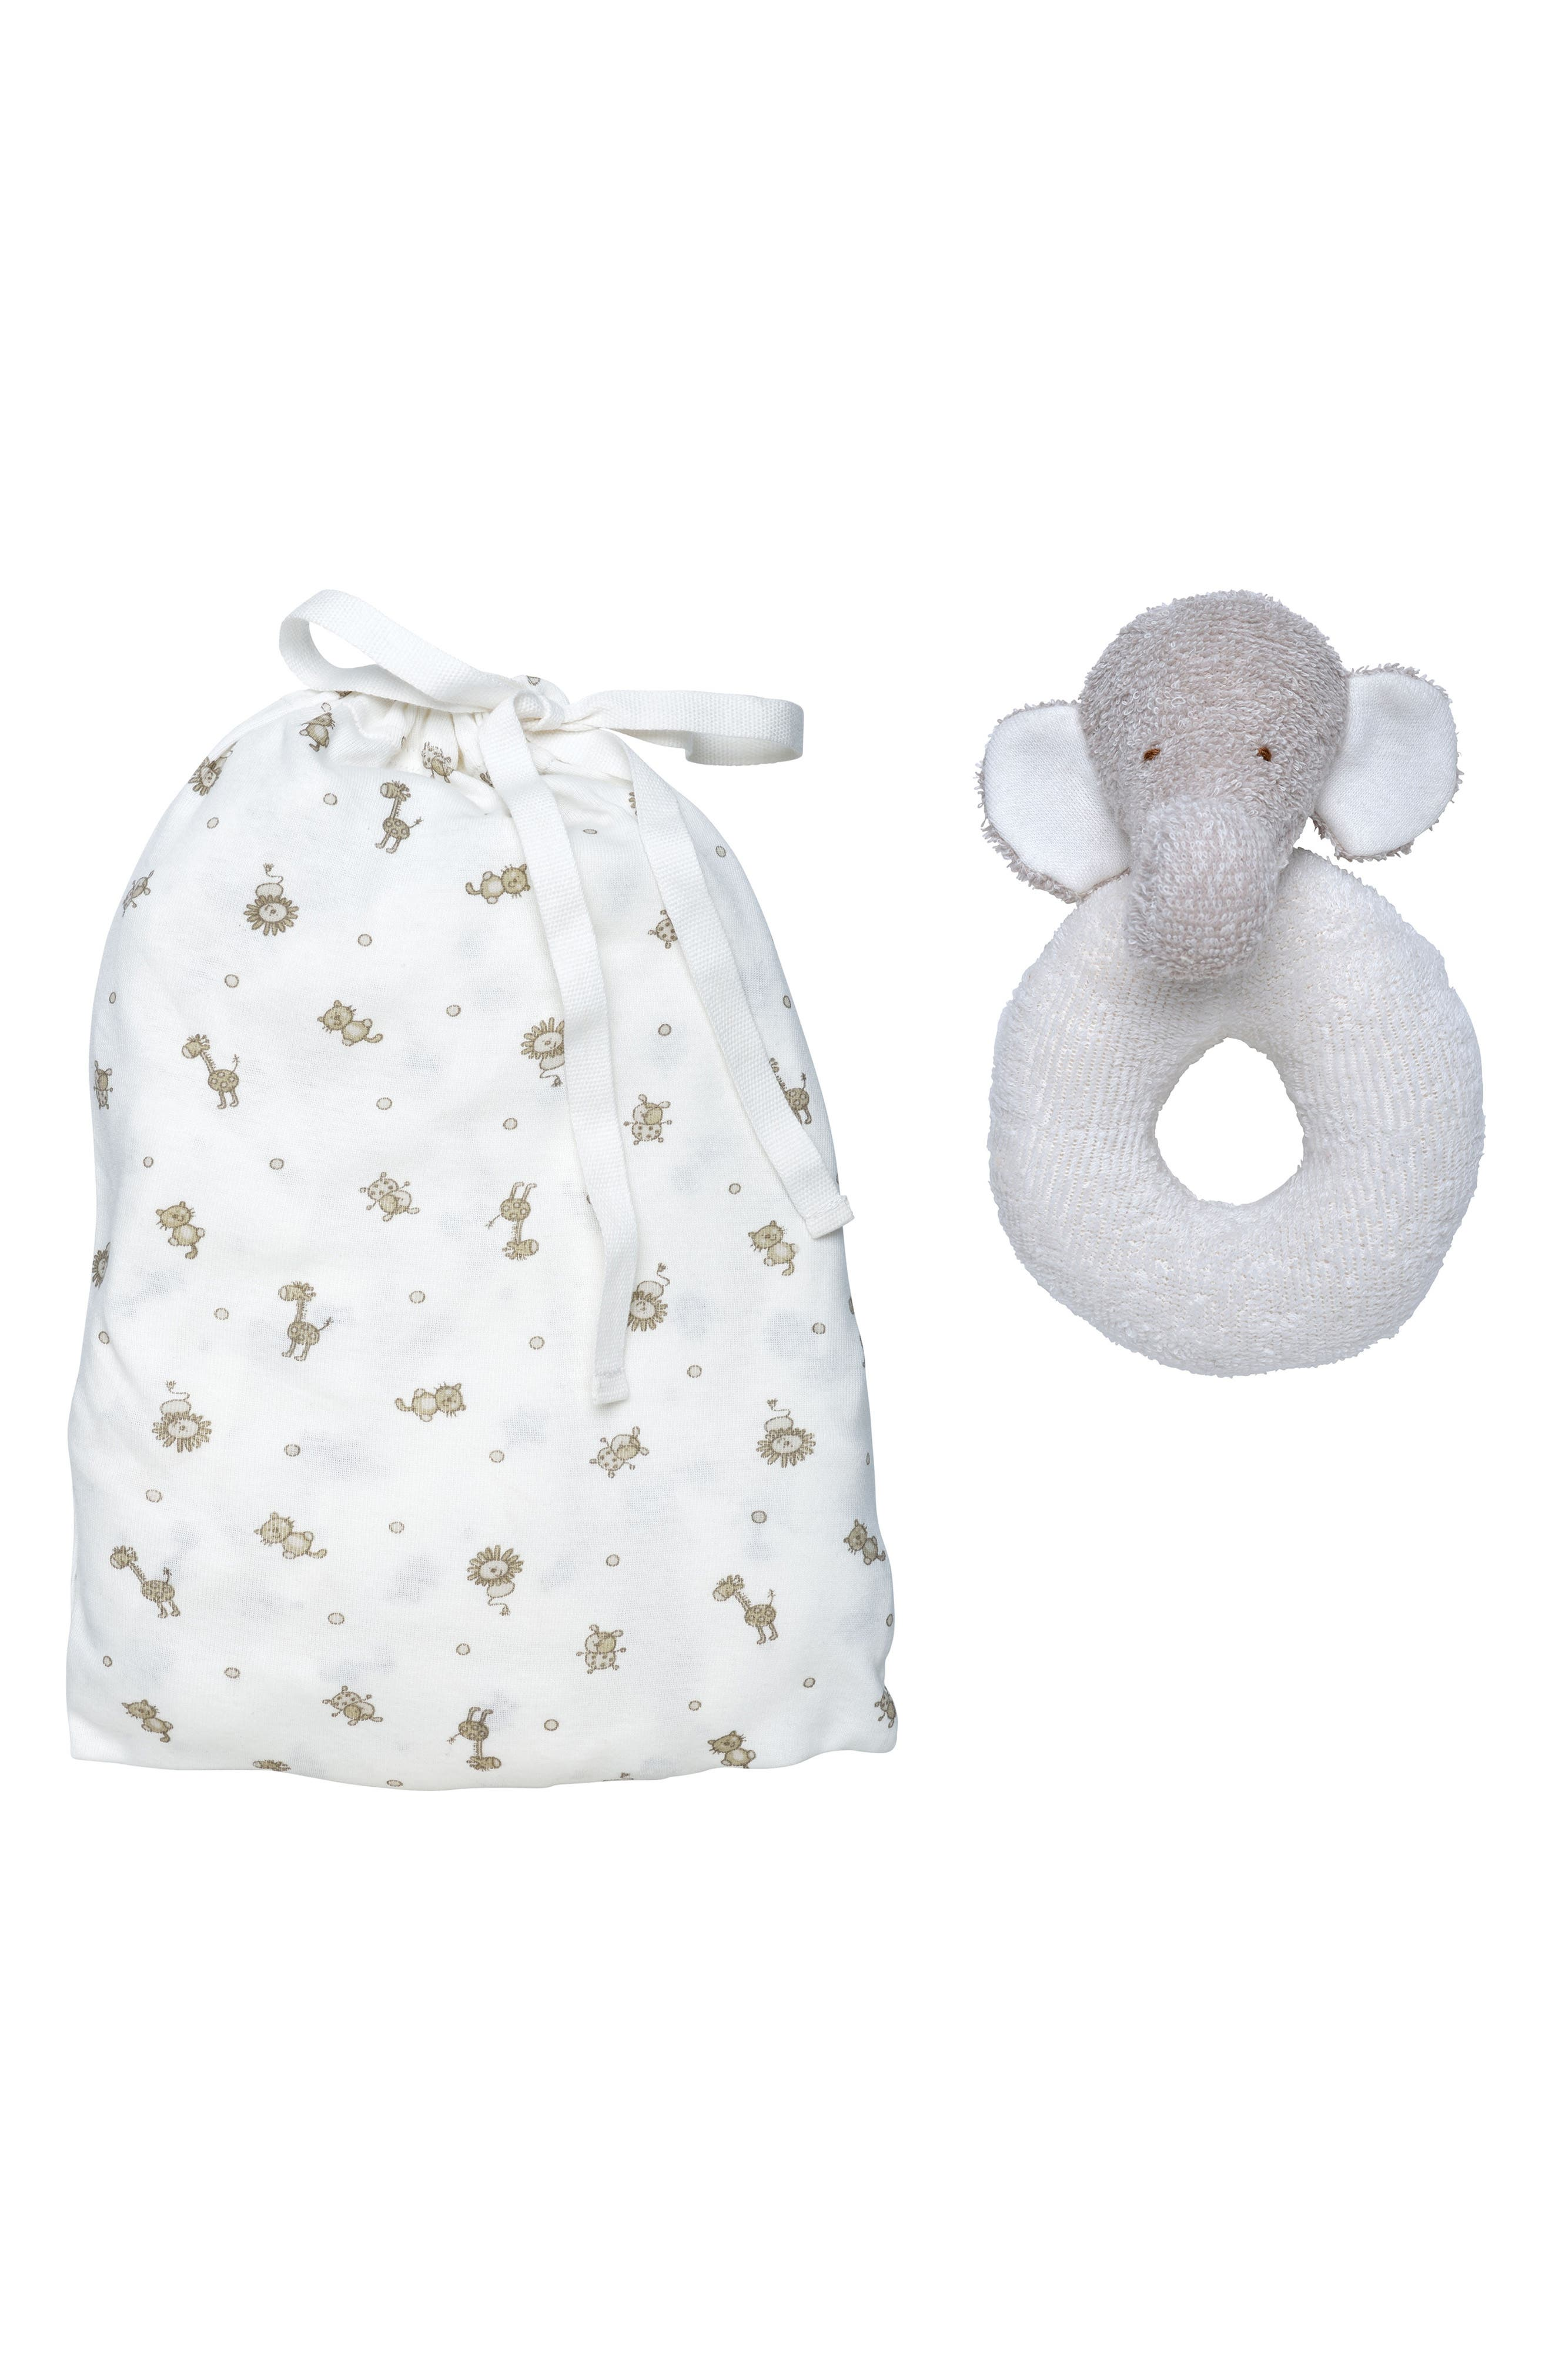 Main Image - Under the Nile 2-Piece Safari Print Fitted Crib Sheet & Stuffed Elephant Toy Set